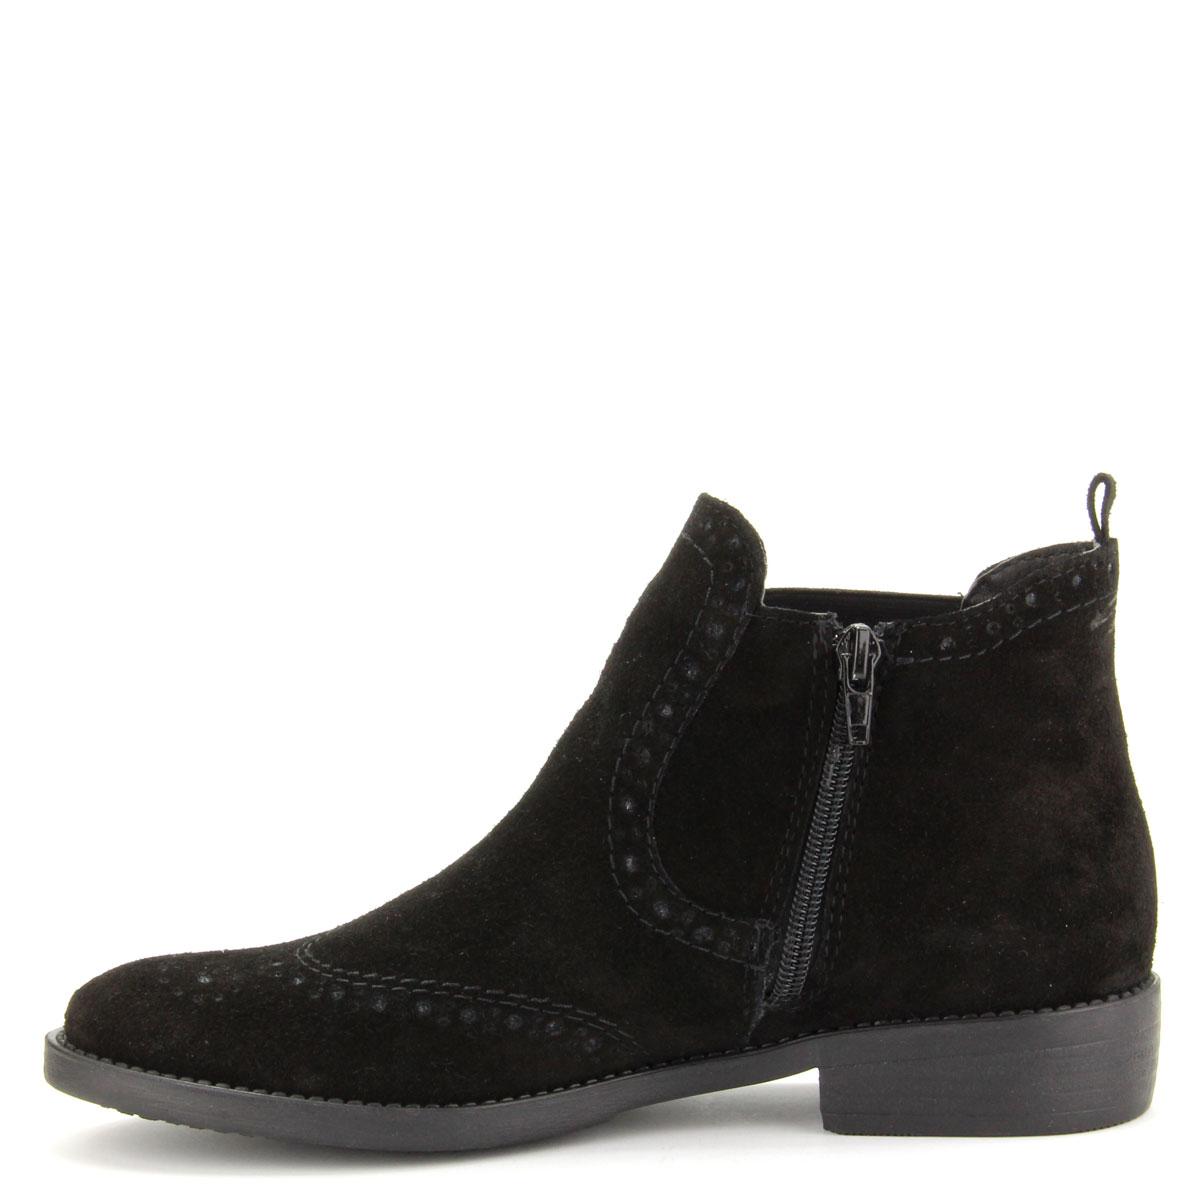 Lapos Tamaris bokacipő Magas szárú cipő Bőr bokacipő